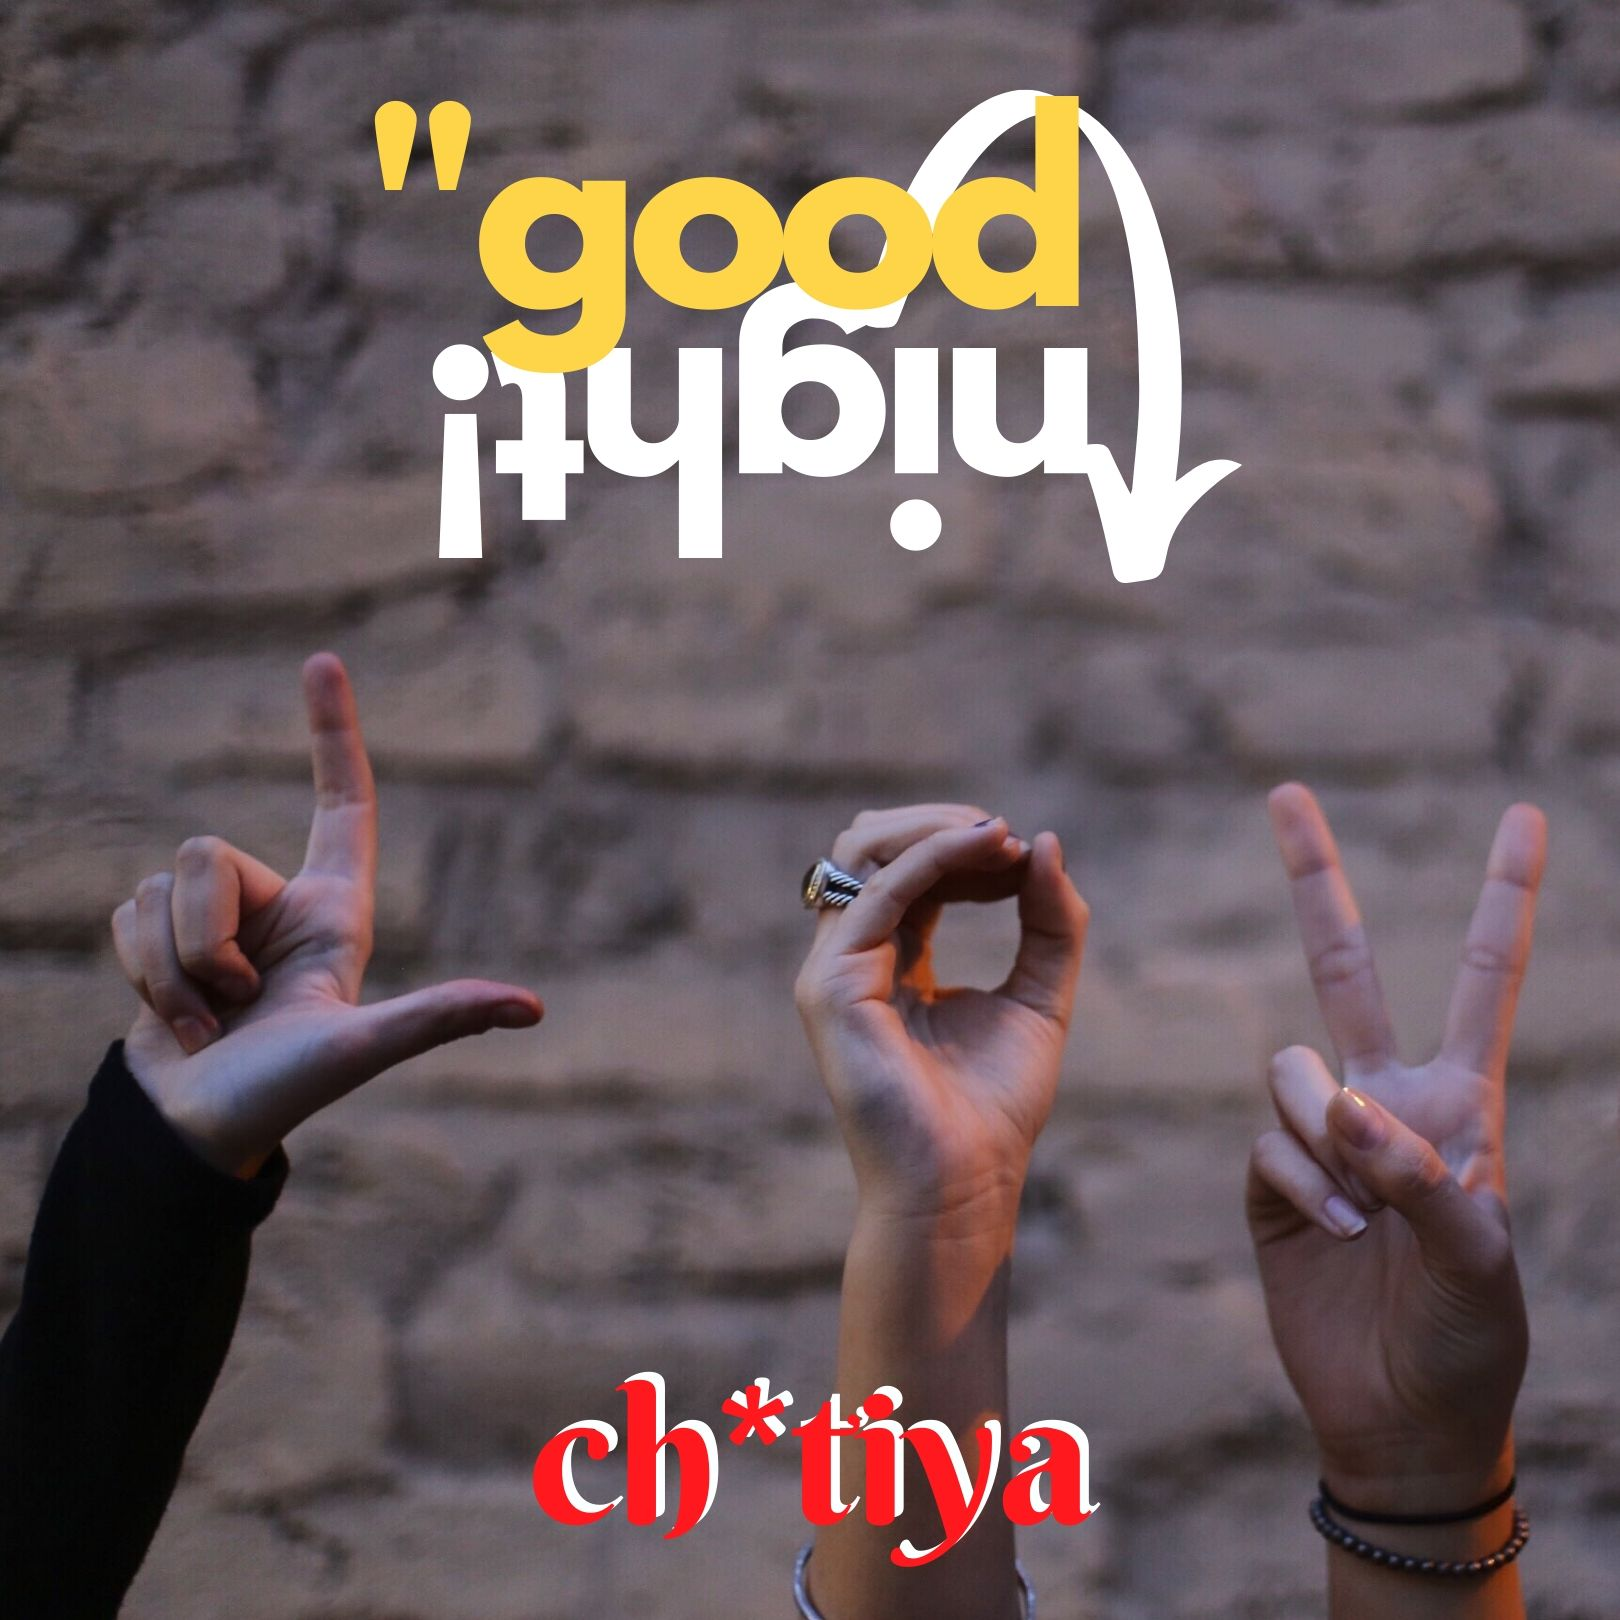 Good Night Image for chuiya friend full HD free download.